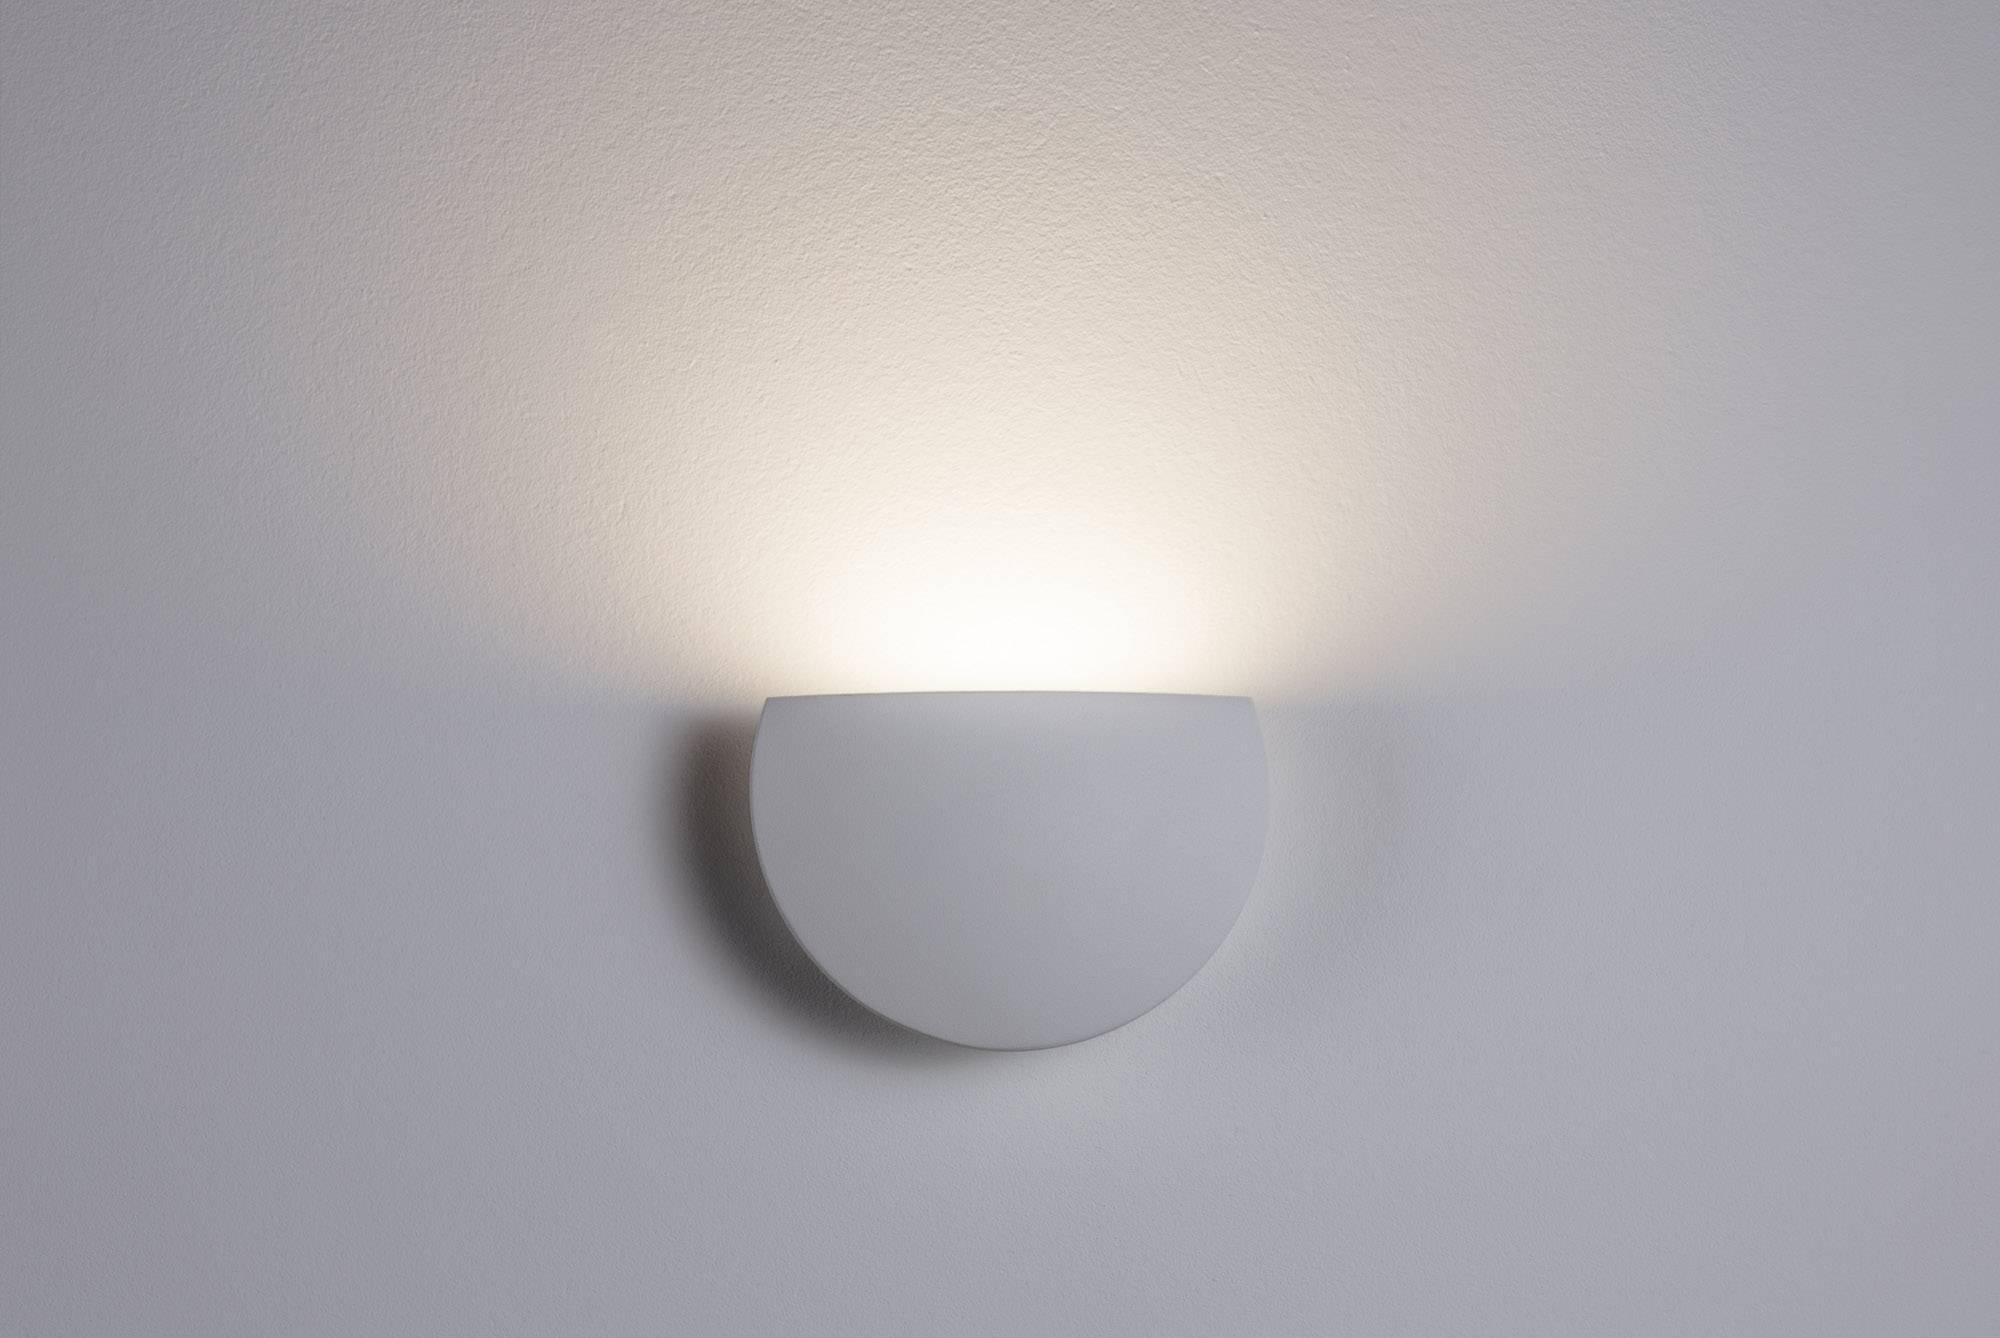 Badkamer Design Wandlamp : Badkamer wandlamp w wit paulmann tulip wit conrad